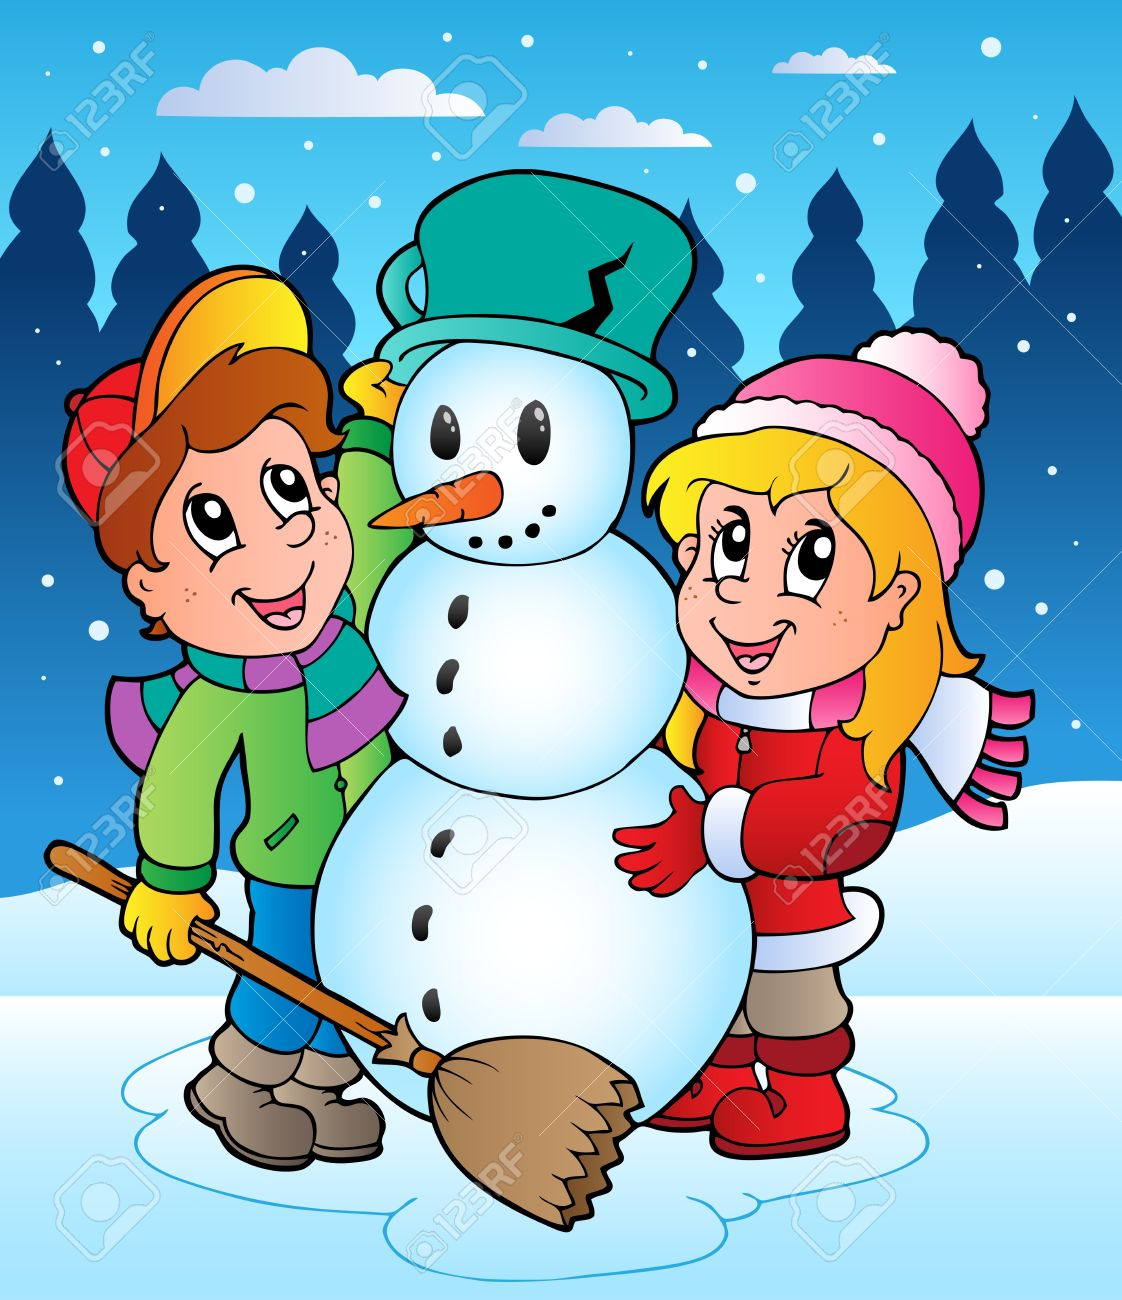 Winter scene with kids 2 - vector illustration. Stock Vector - 11125000